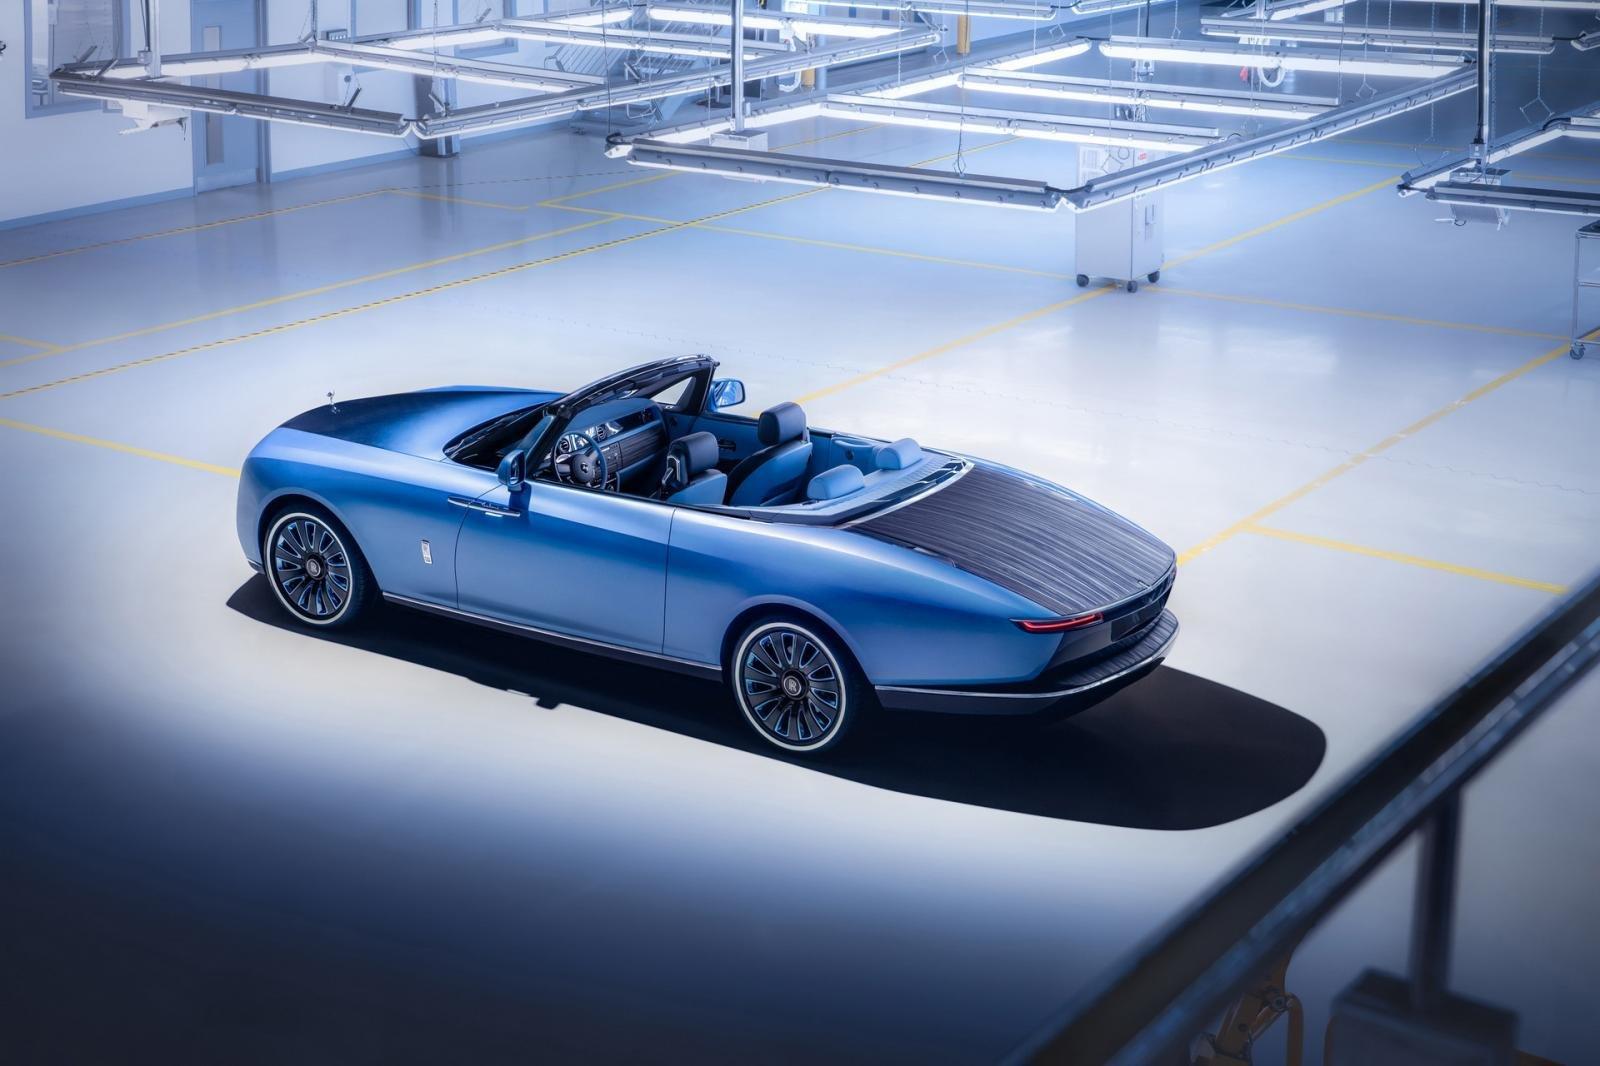 Rolls-Royce 'Boat Tail' trị giá 28 triệu USD - Ảnh 1.